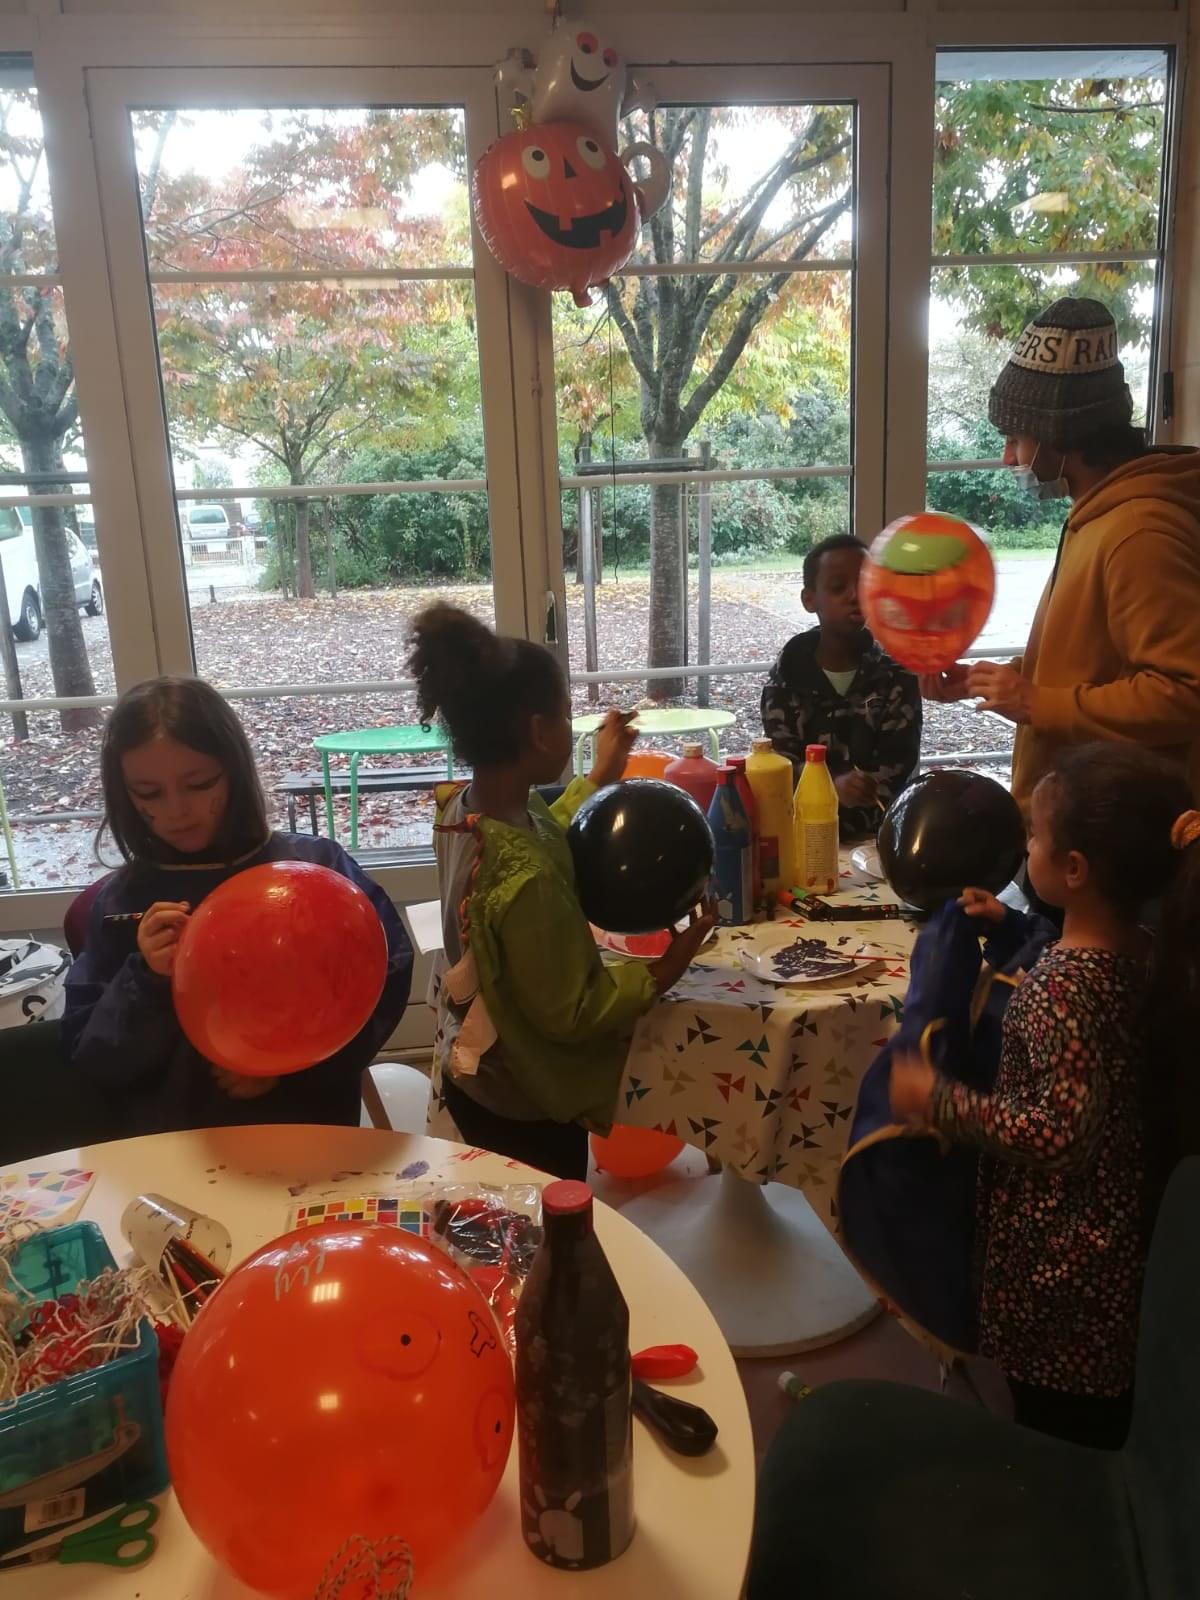 6-11 ans : Les vacances d'octobre des enfants !!